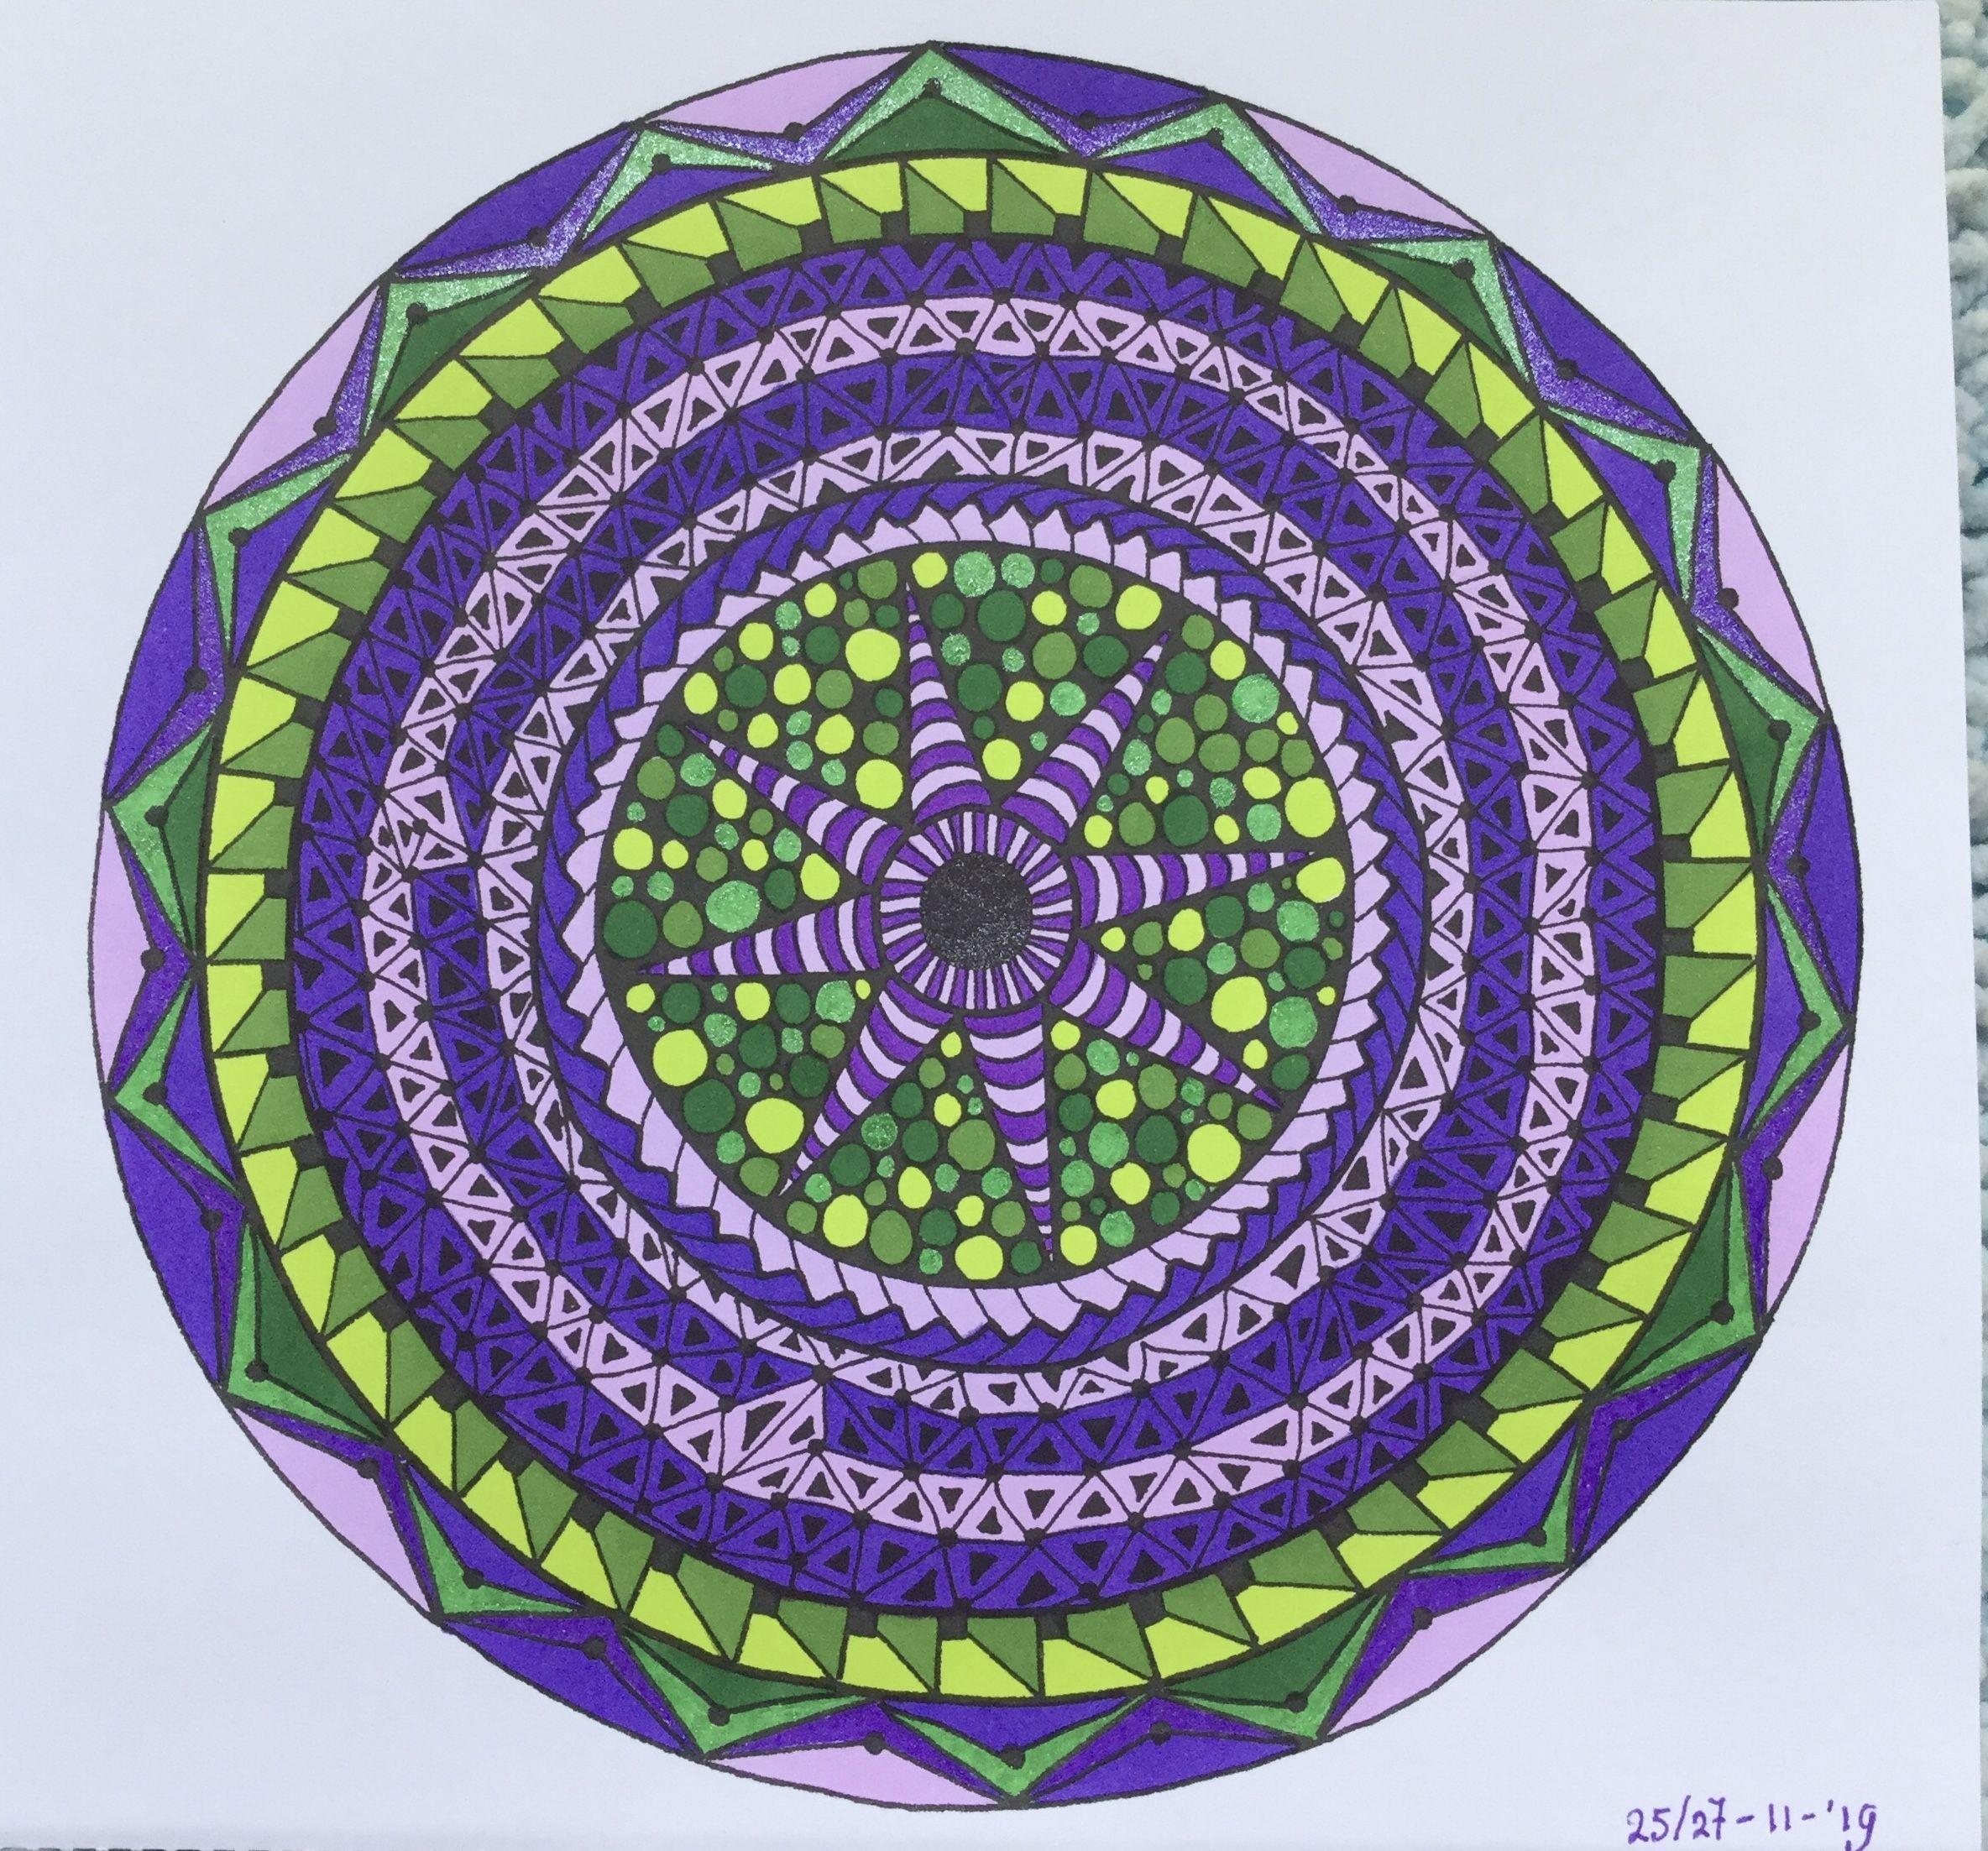 pin gea der wal op gekleurde mandalas kleurplaten